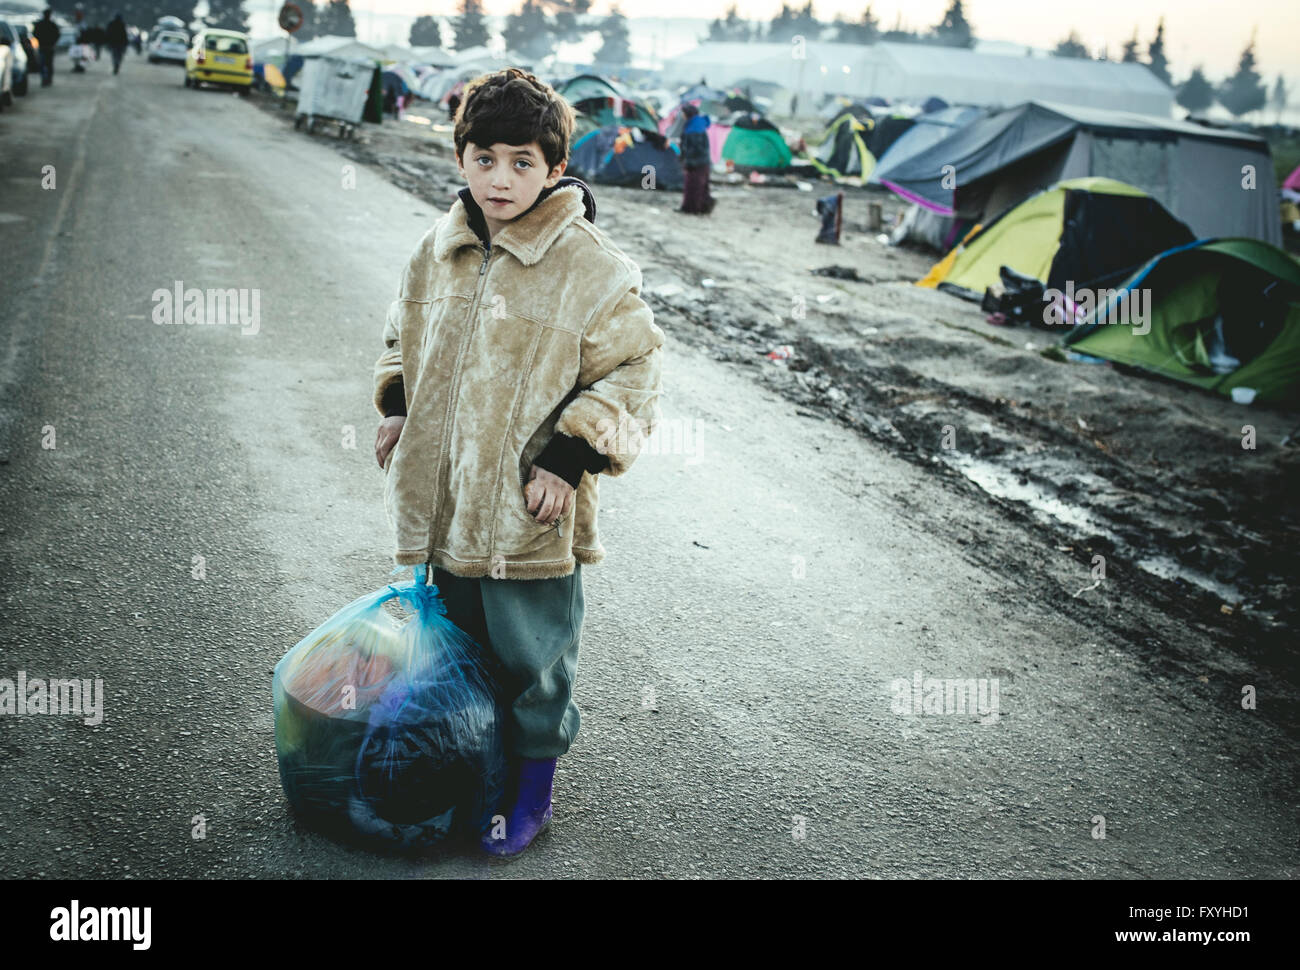 Afghan boy, child refugee, refugee camp in Idomeni, border with Macedonia, Greece - Stock Image